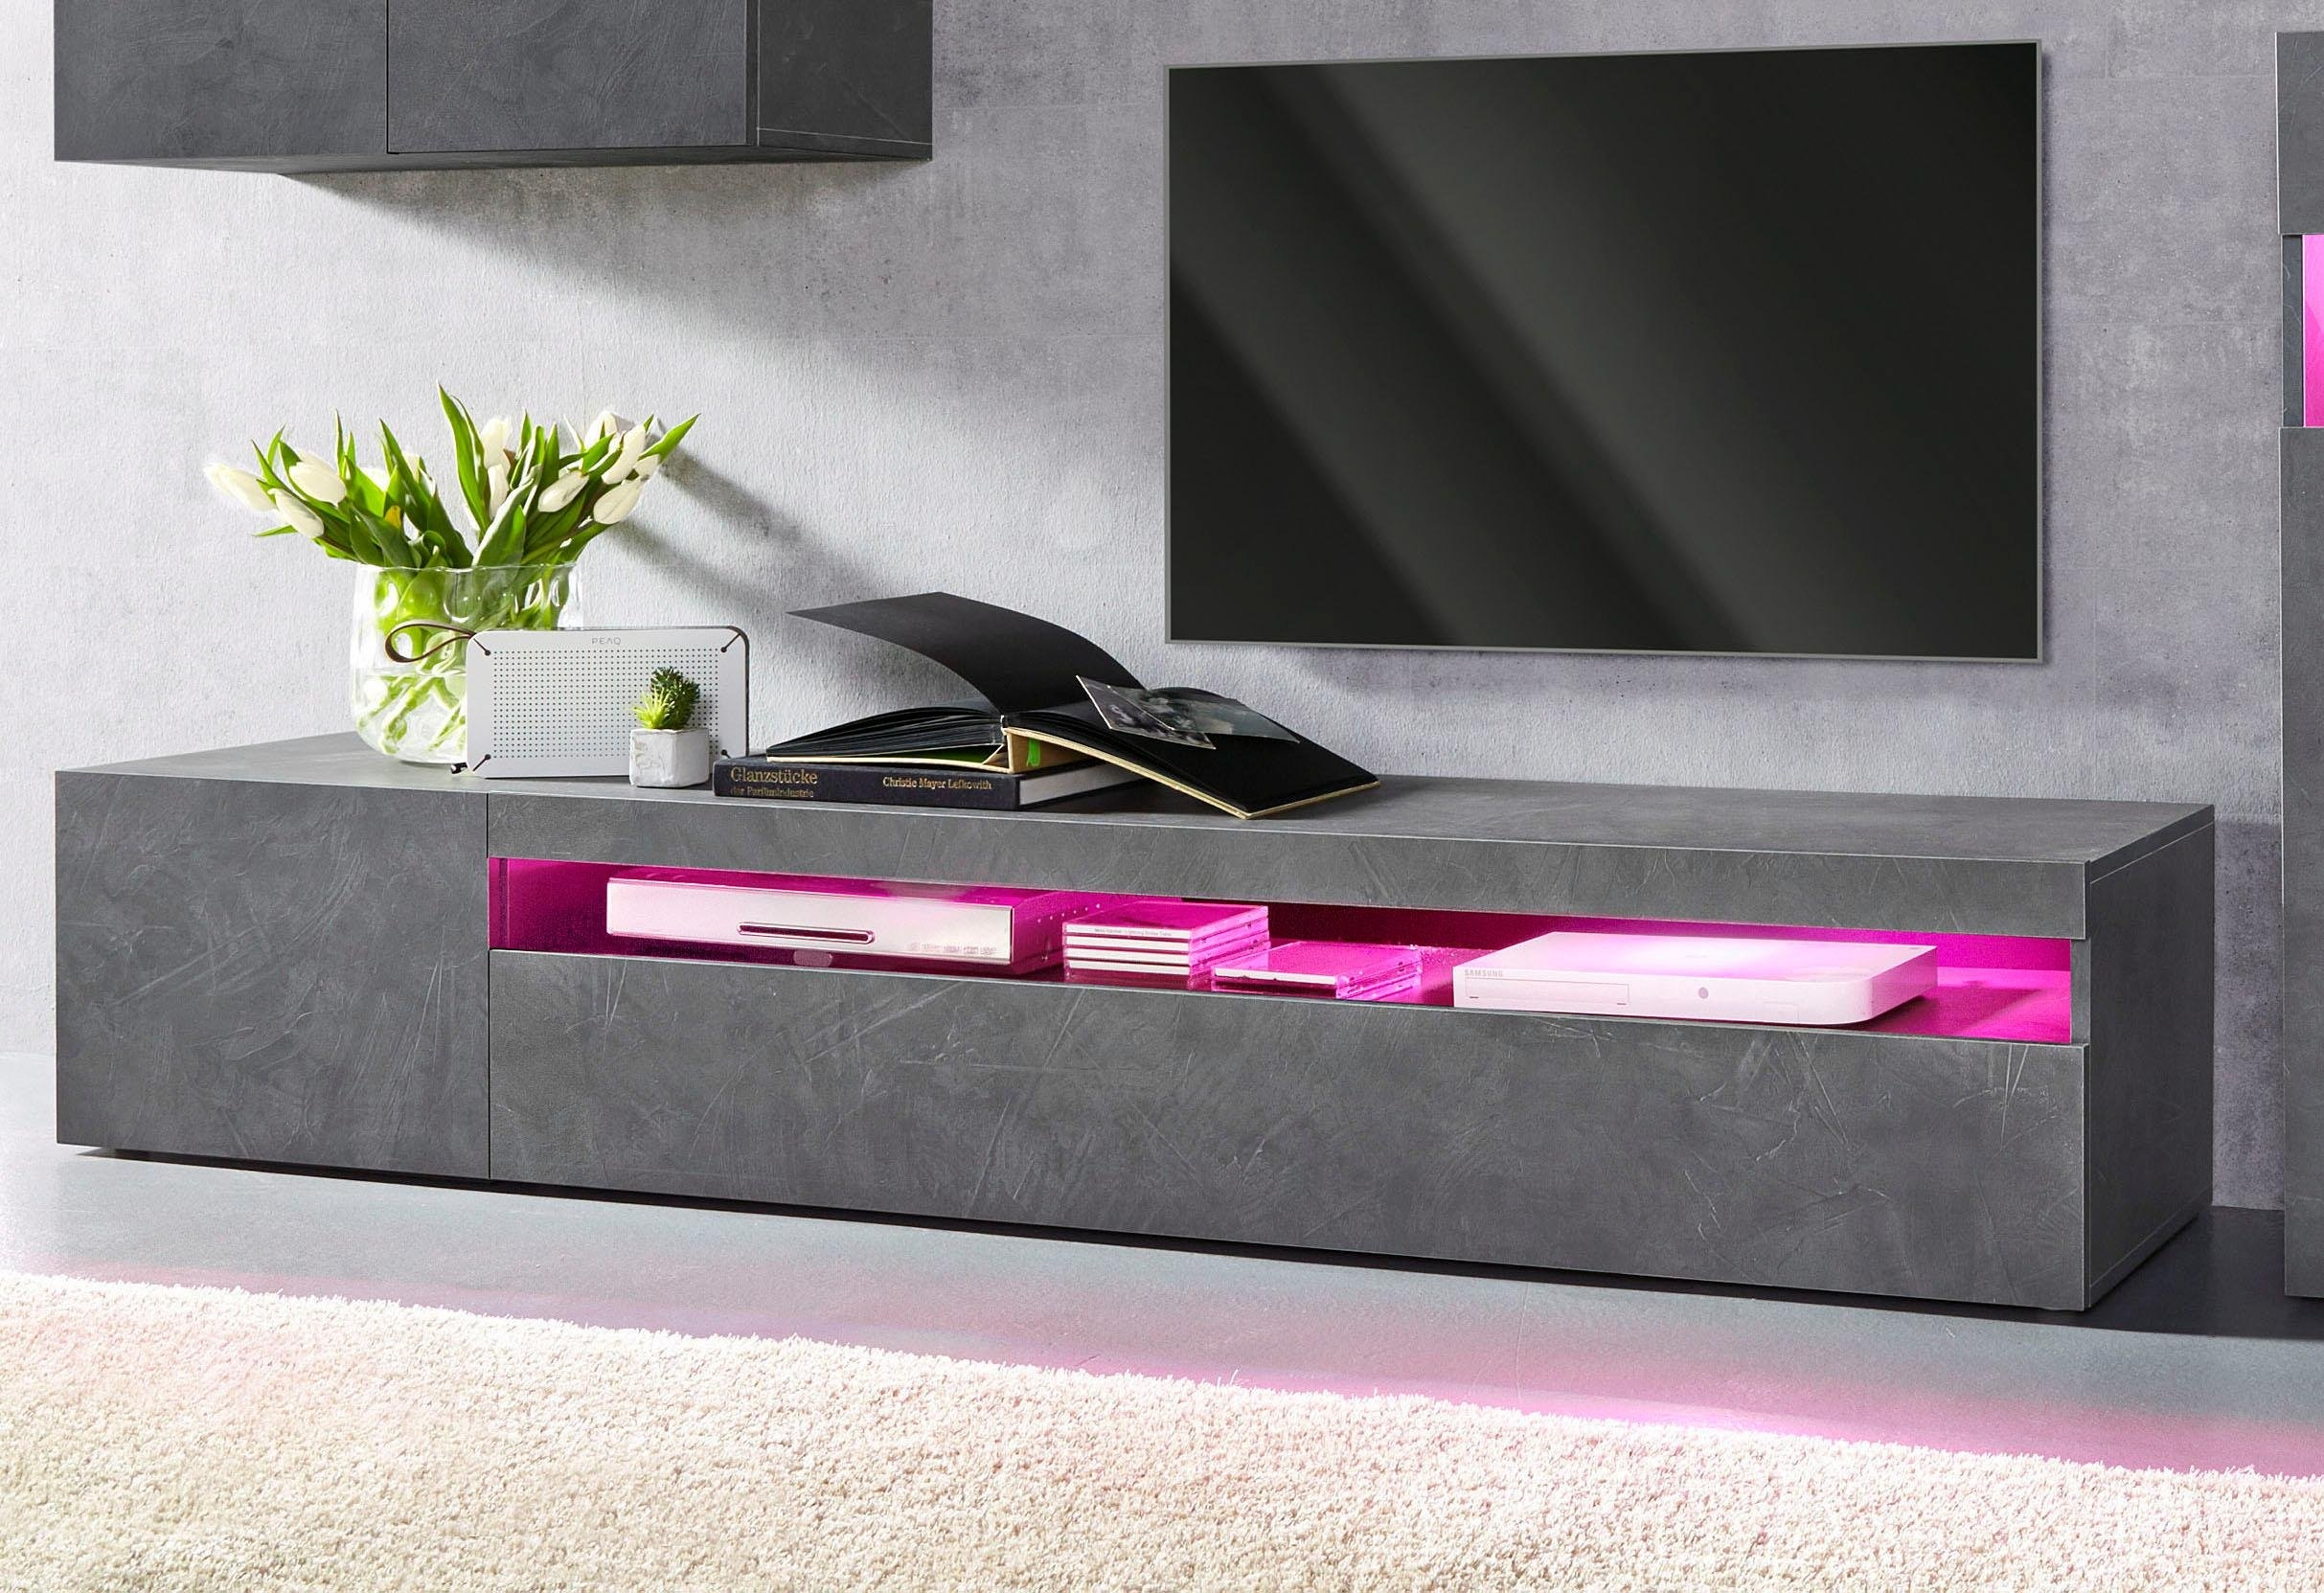 Tecnos Lowboard, breedte 200 cm goedkoop op otto.nl kopen